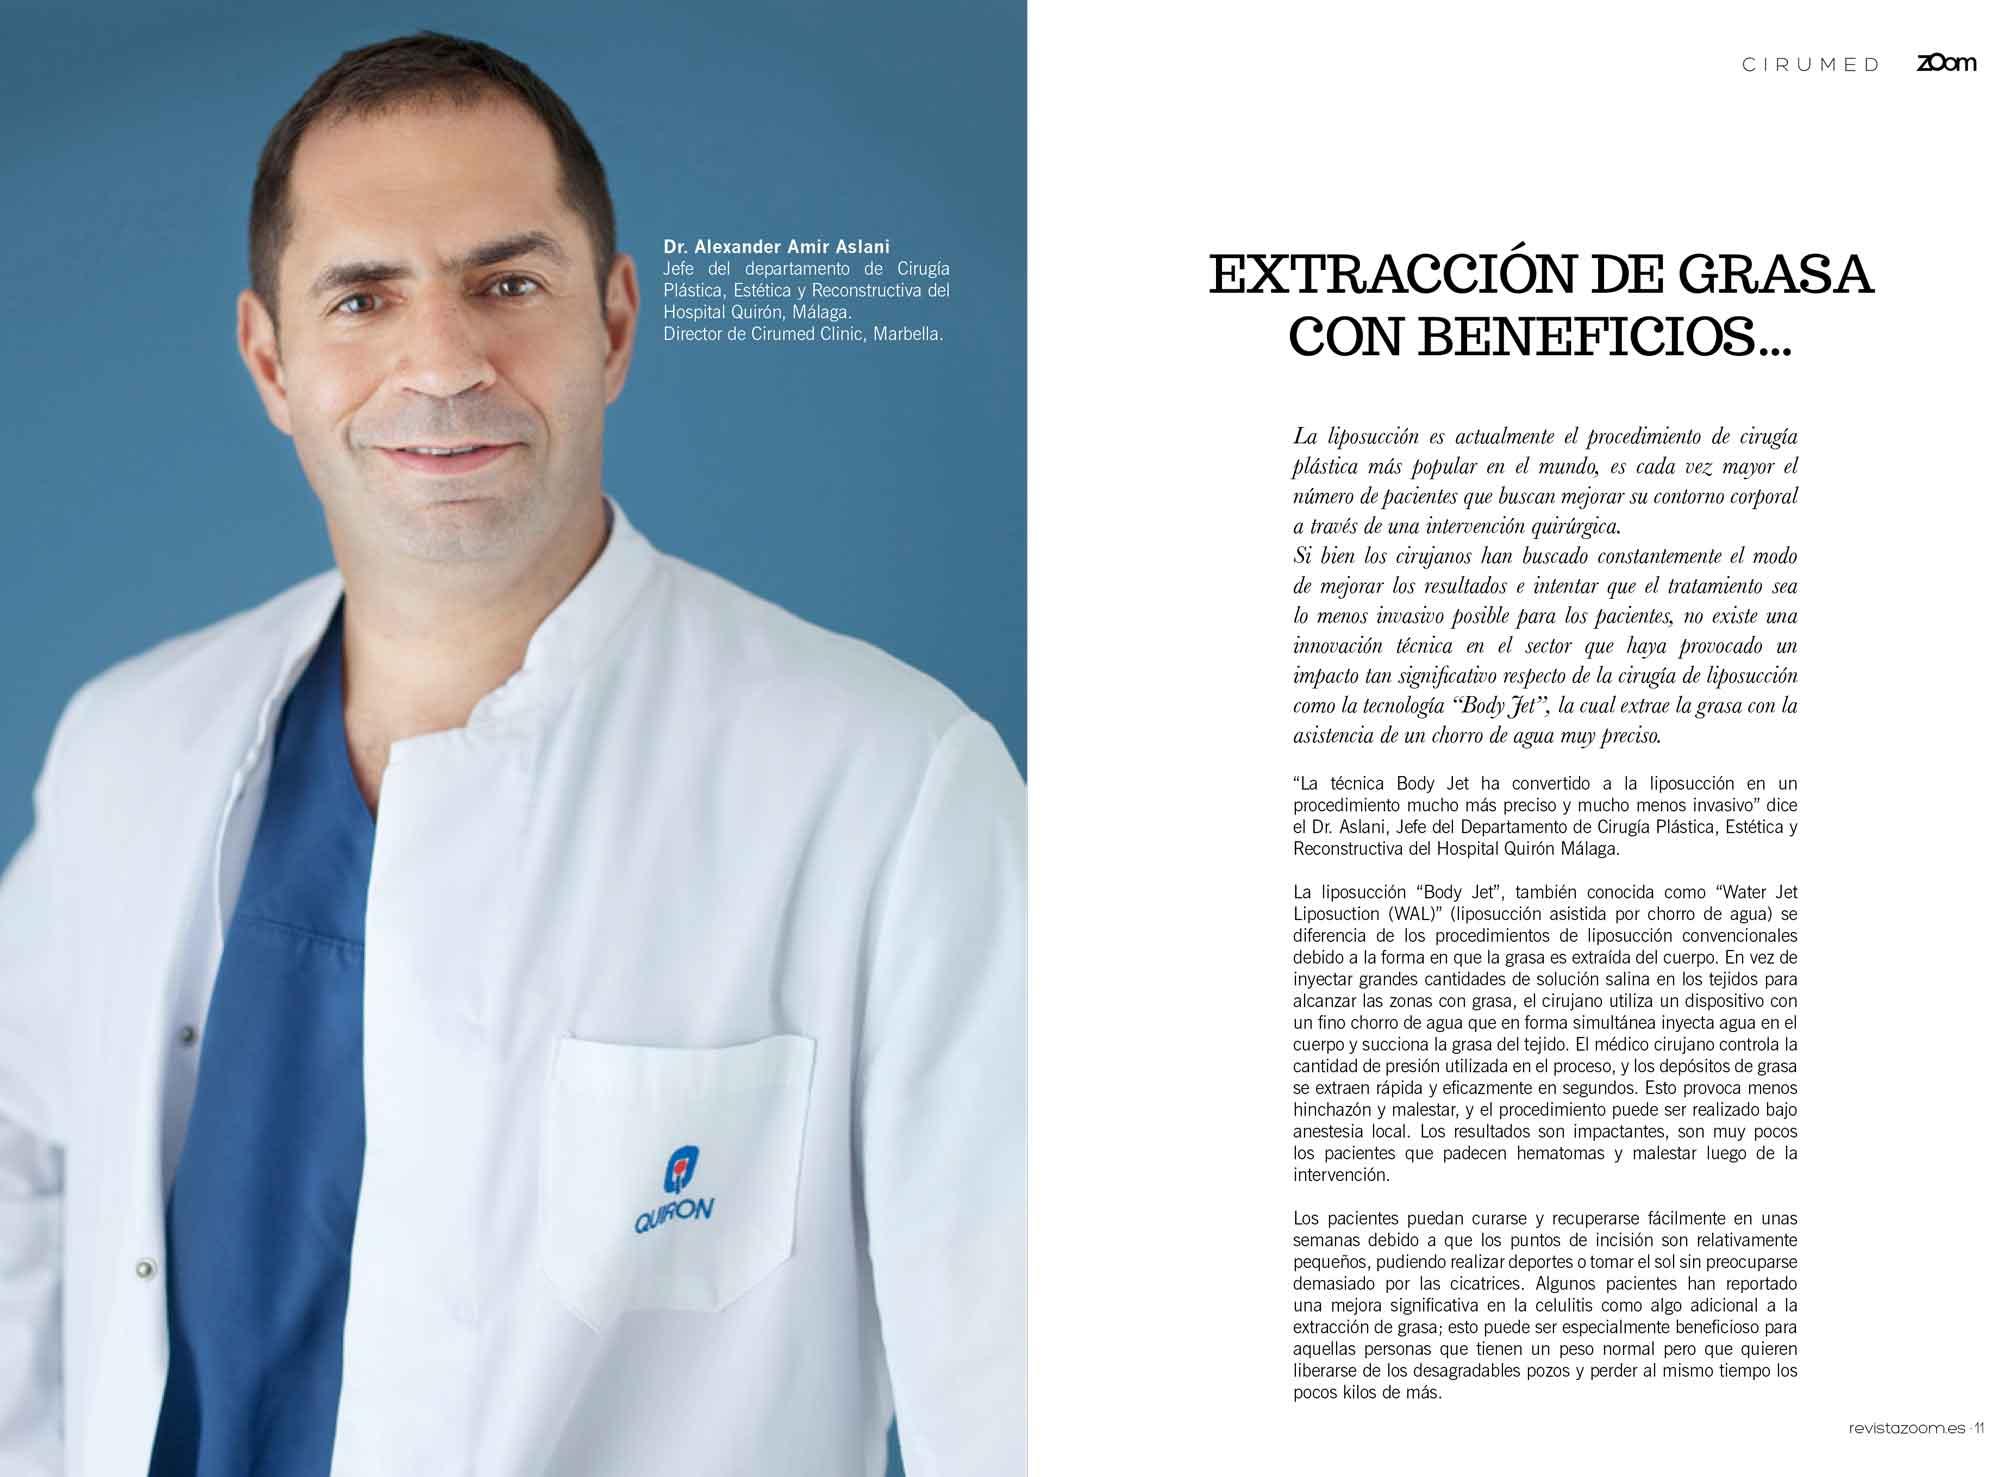 lipotransferencia-expertos-cirugia-plastica